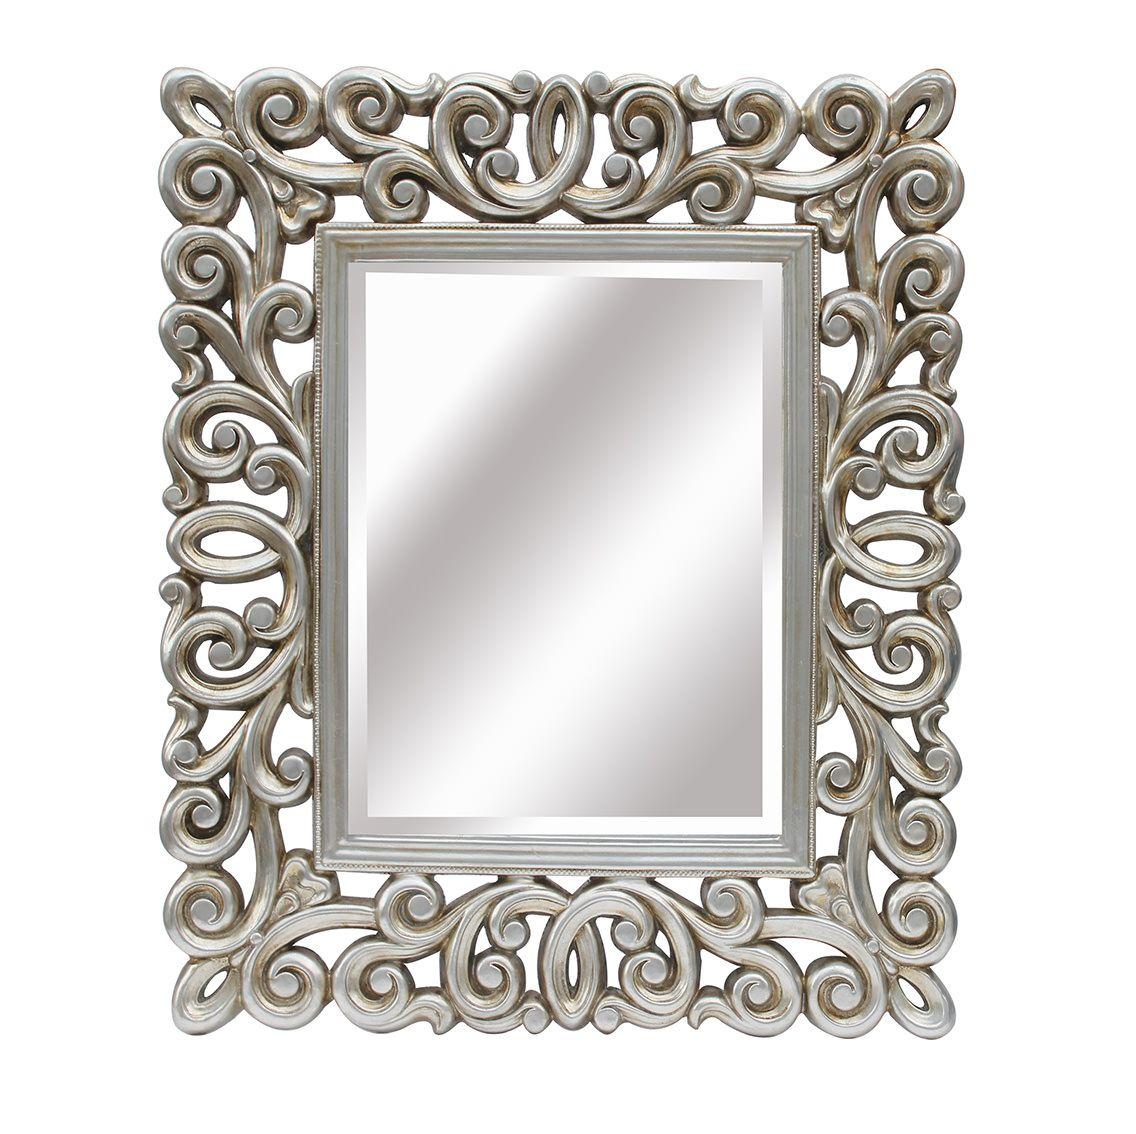 Espejo con marco de resina cuadrado plata lleno de molduras - Espejos de resina ...